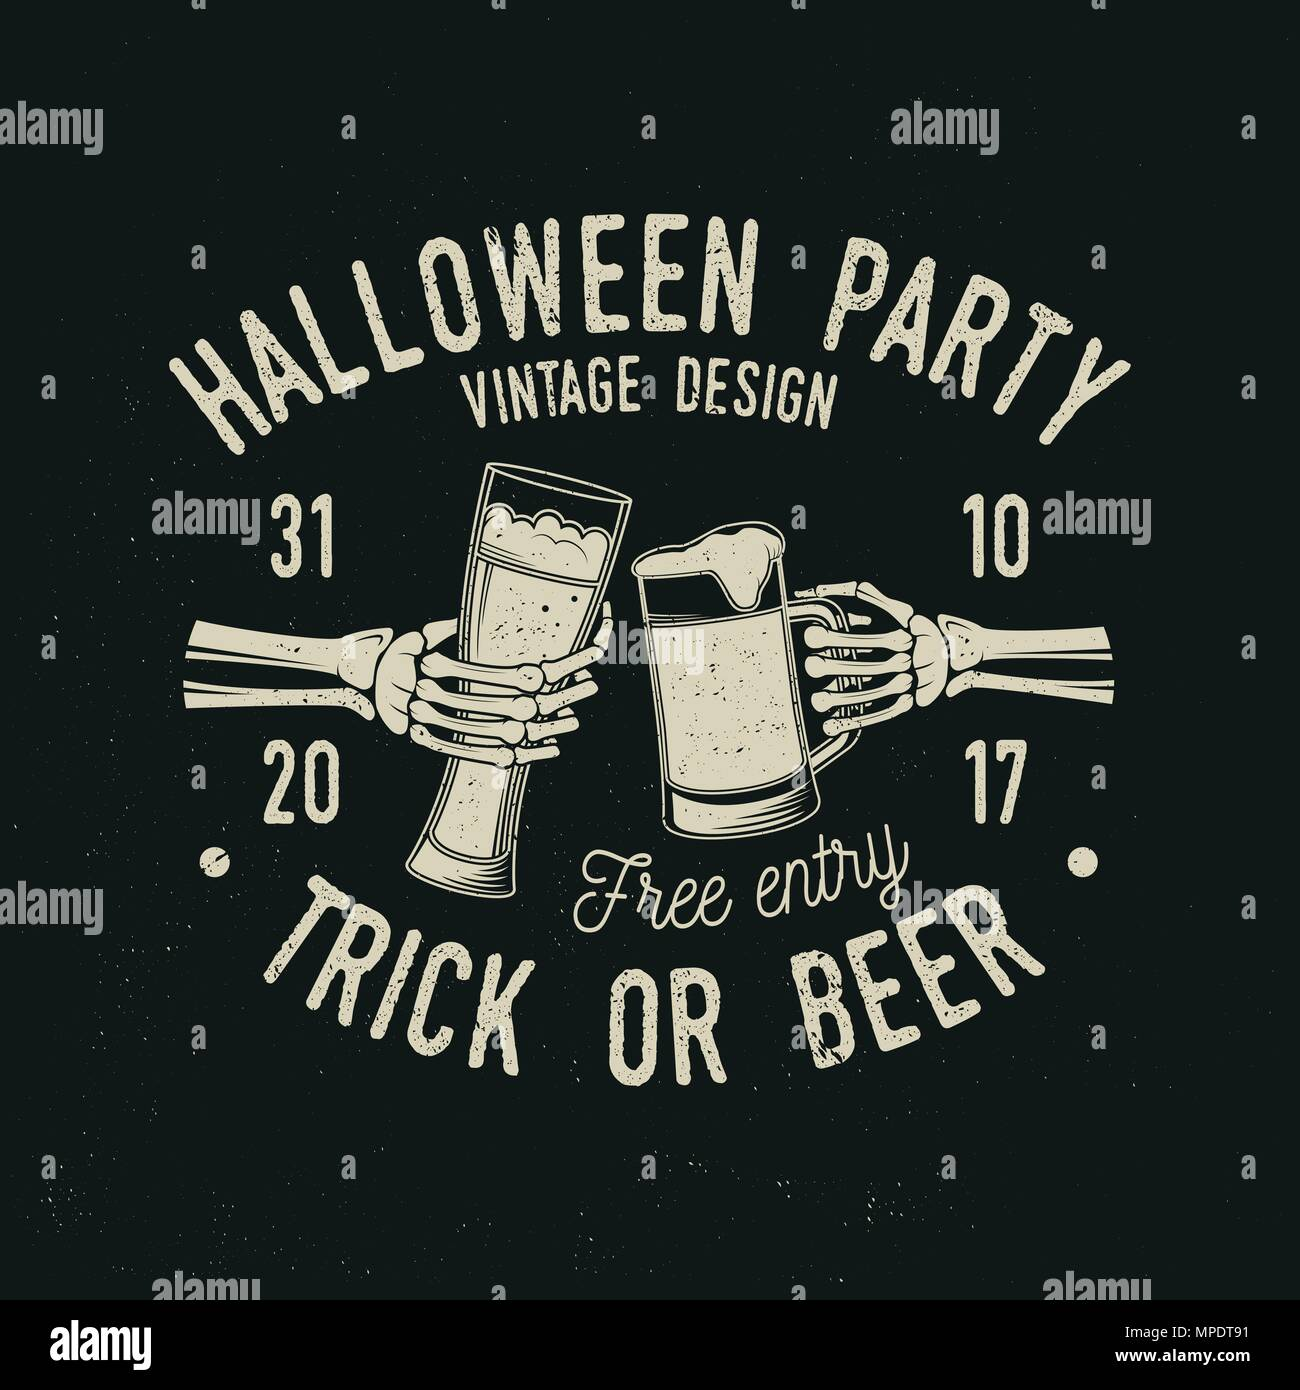 Halloween Bier.Halloween Party Trick Oder Bier Vektor Halloween Retro